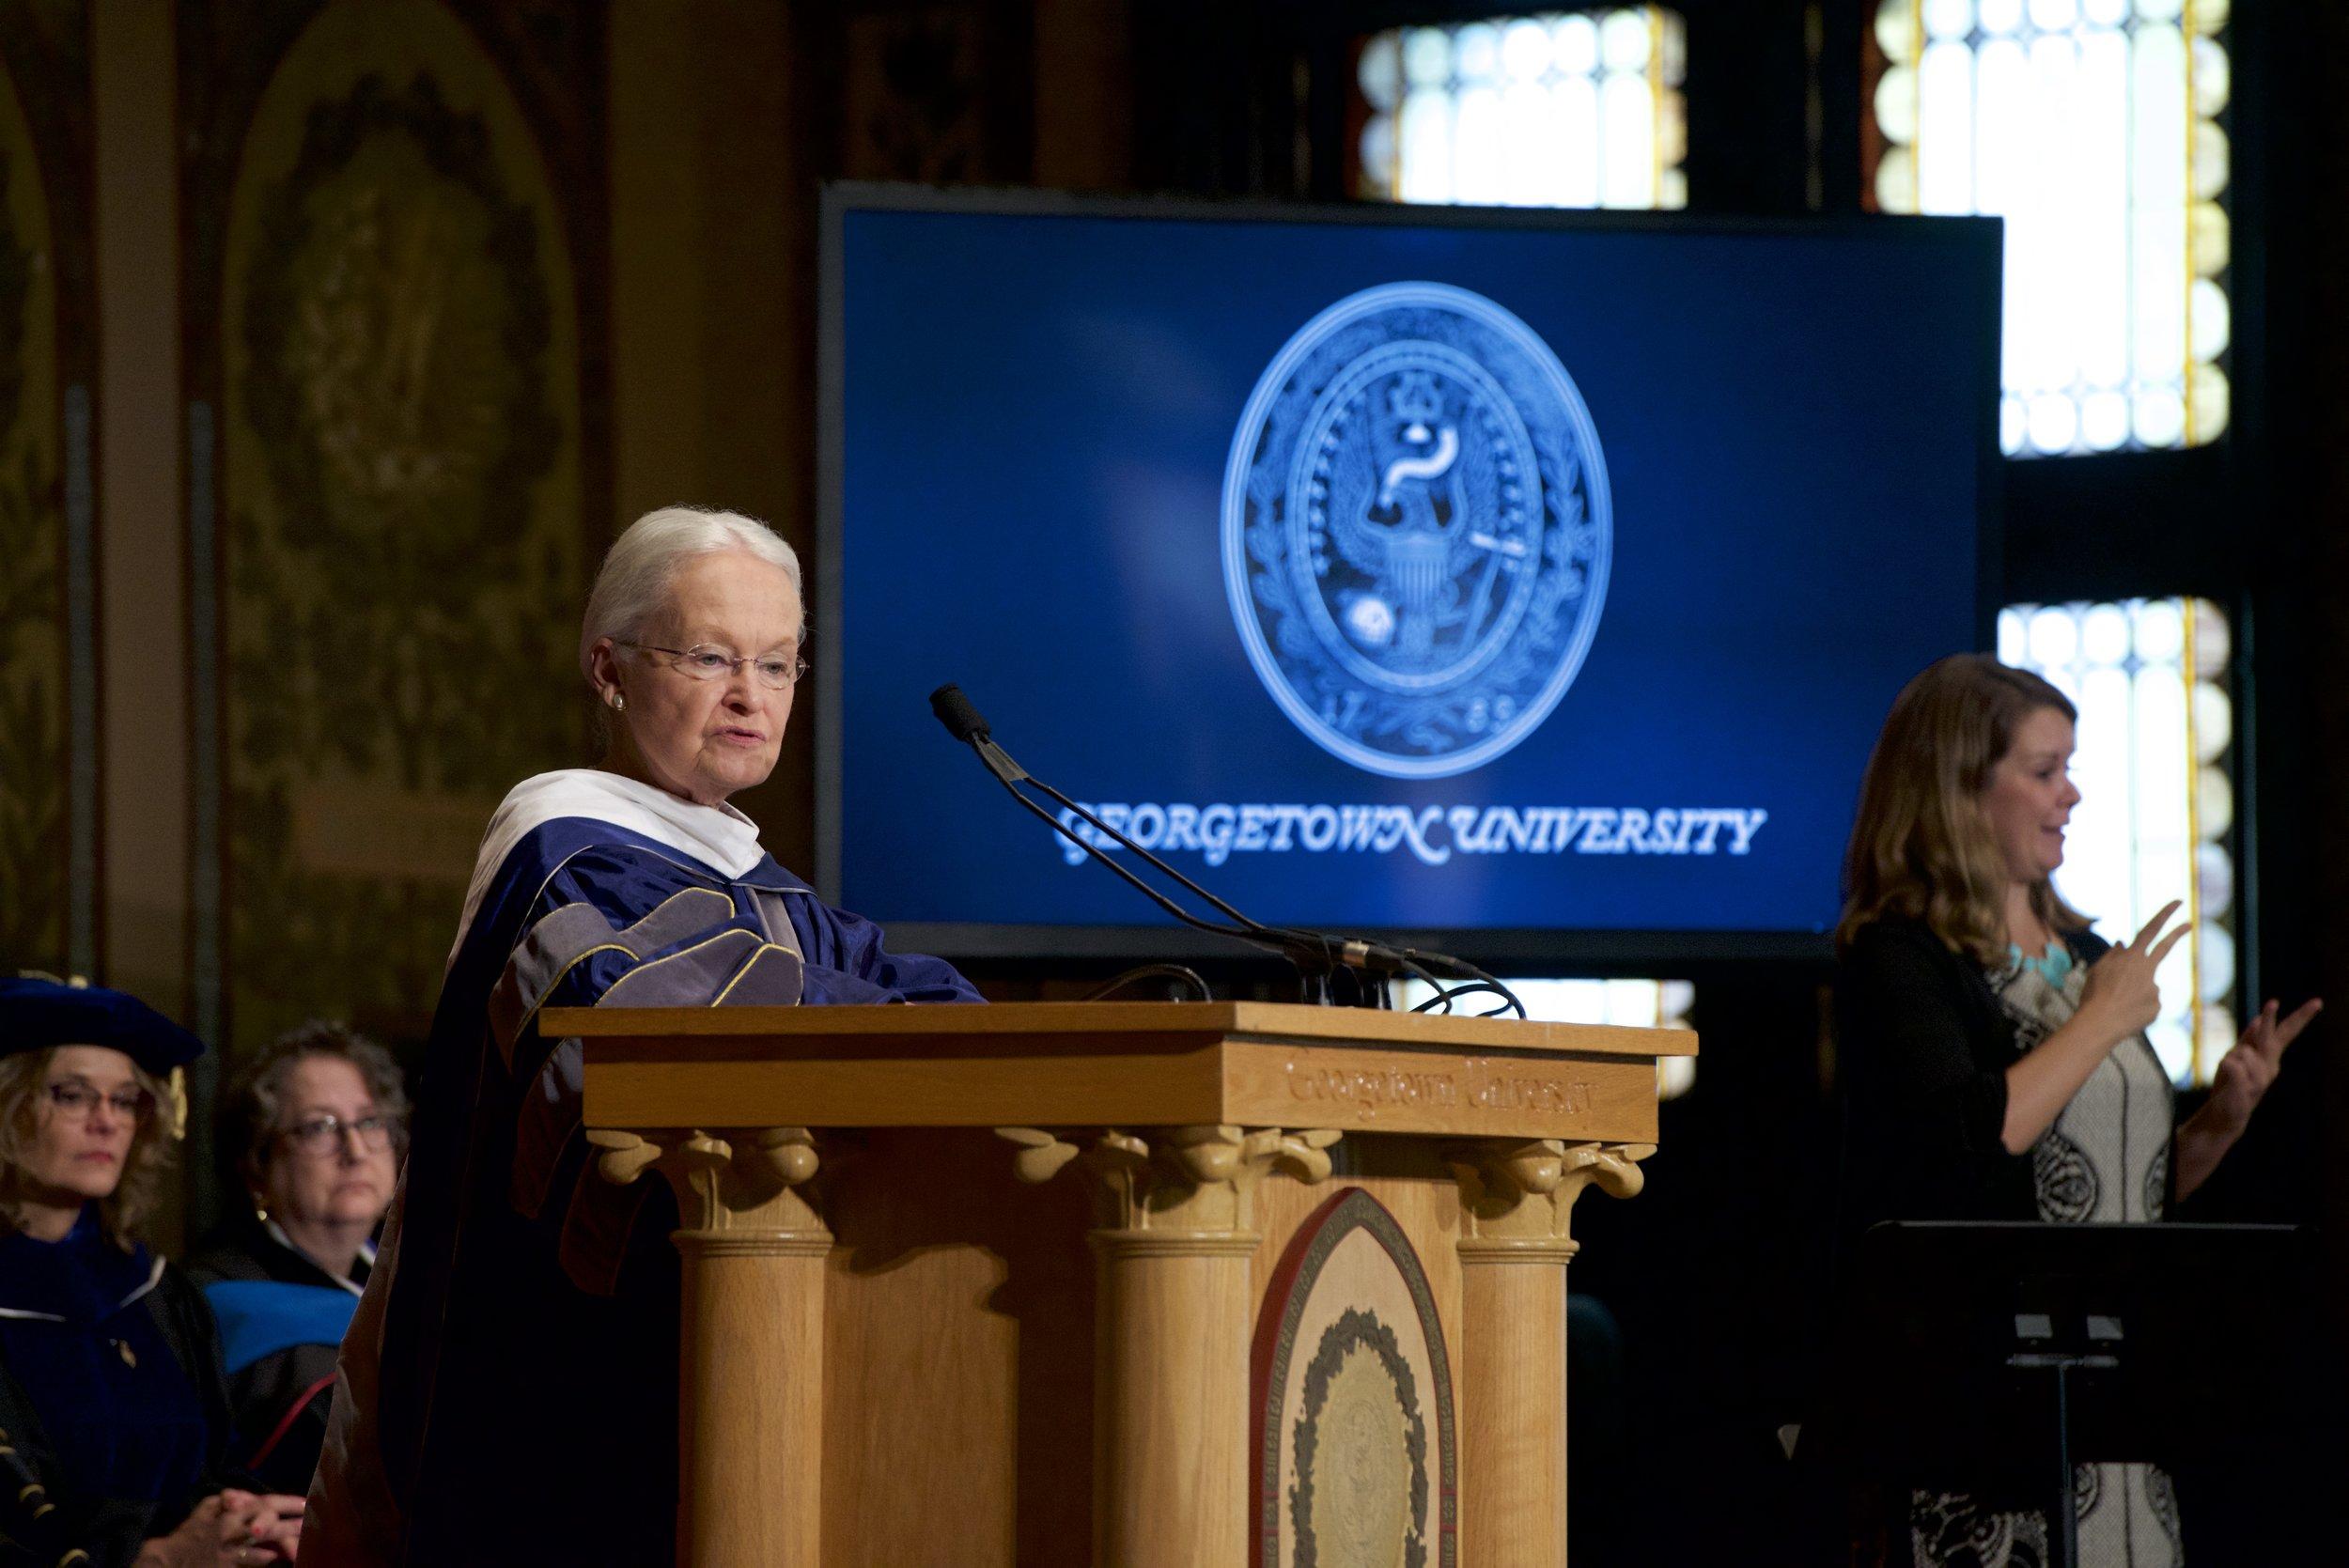 Photo courtesy of Rafael Suanes / Georgetown University